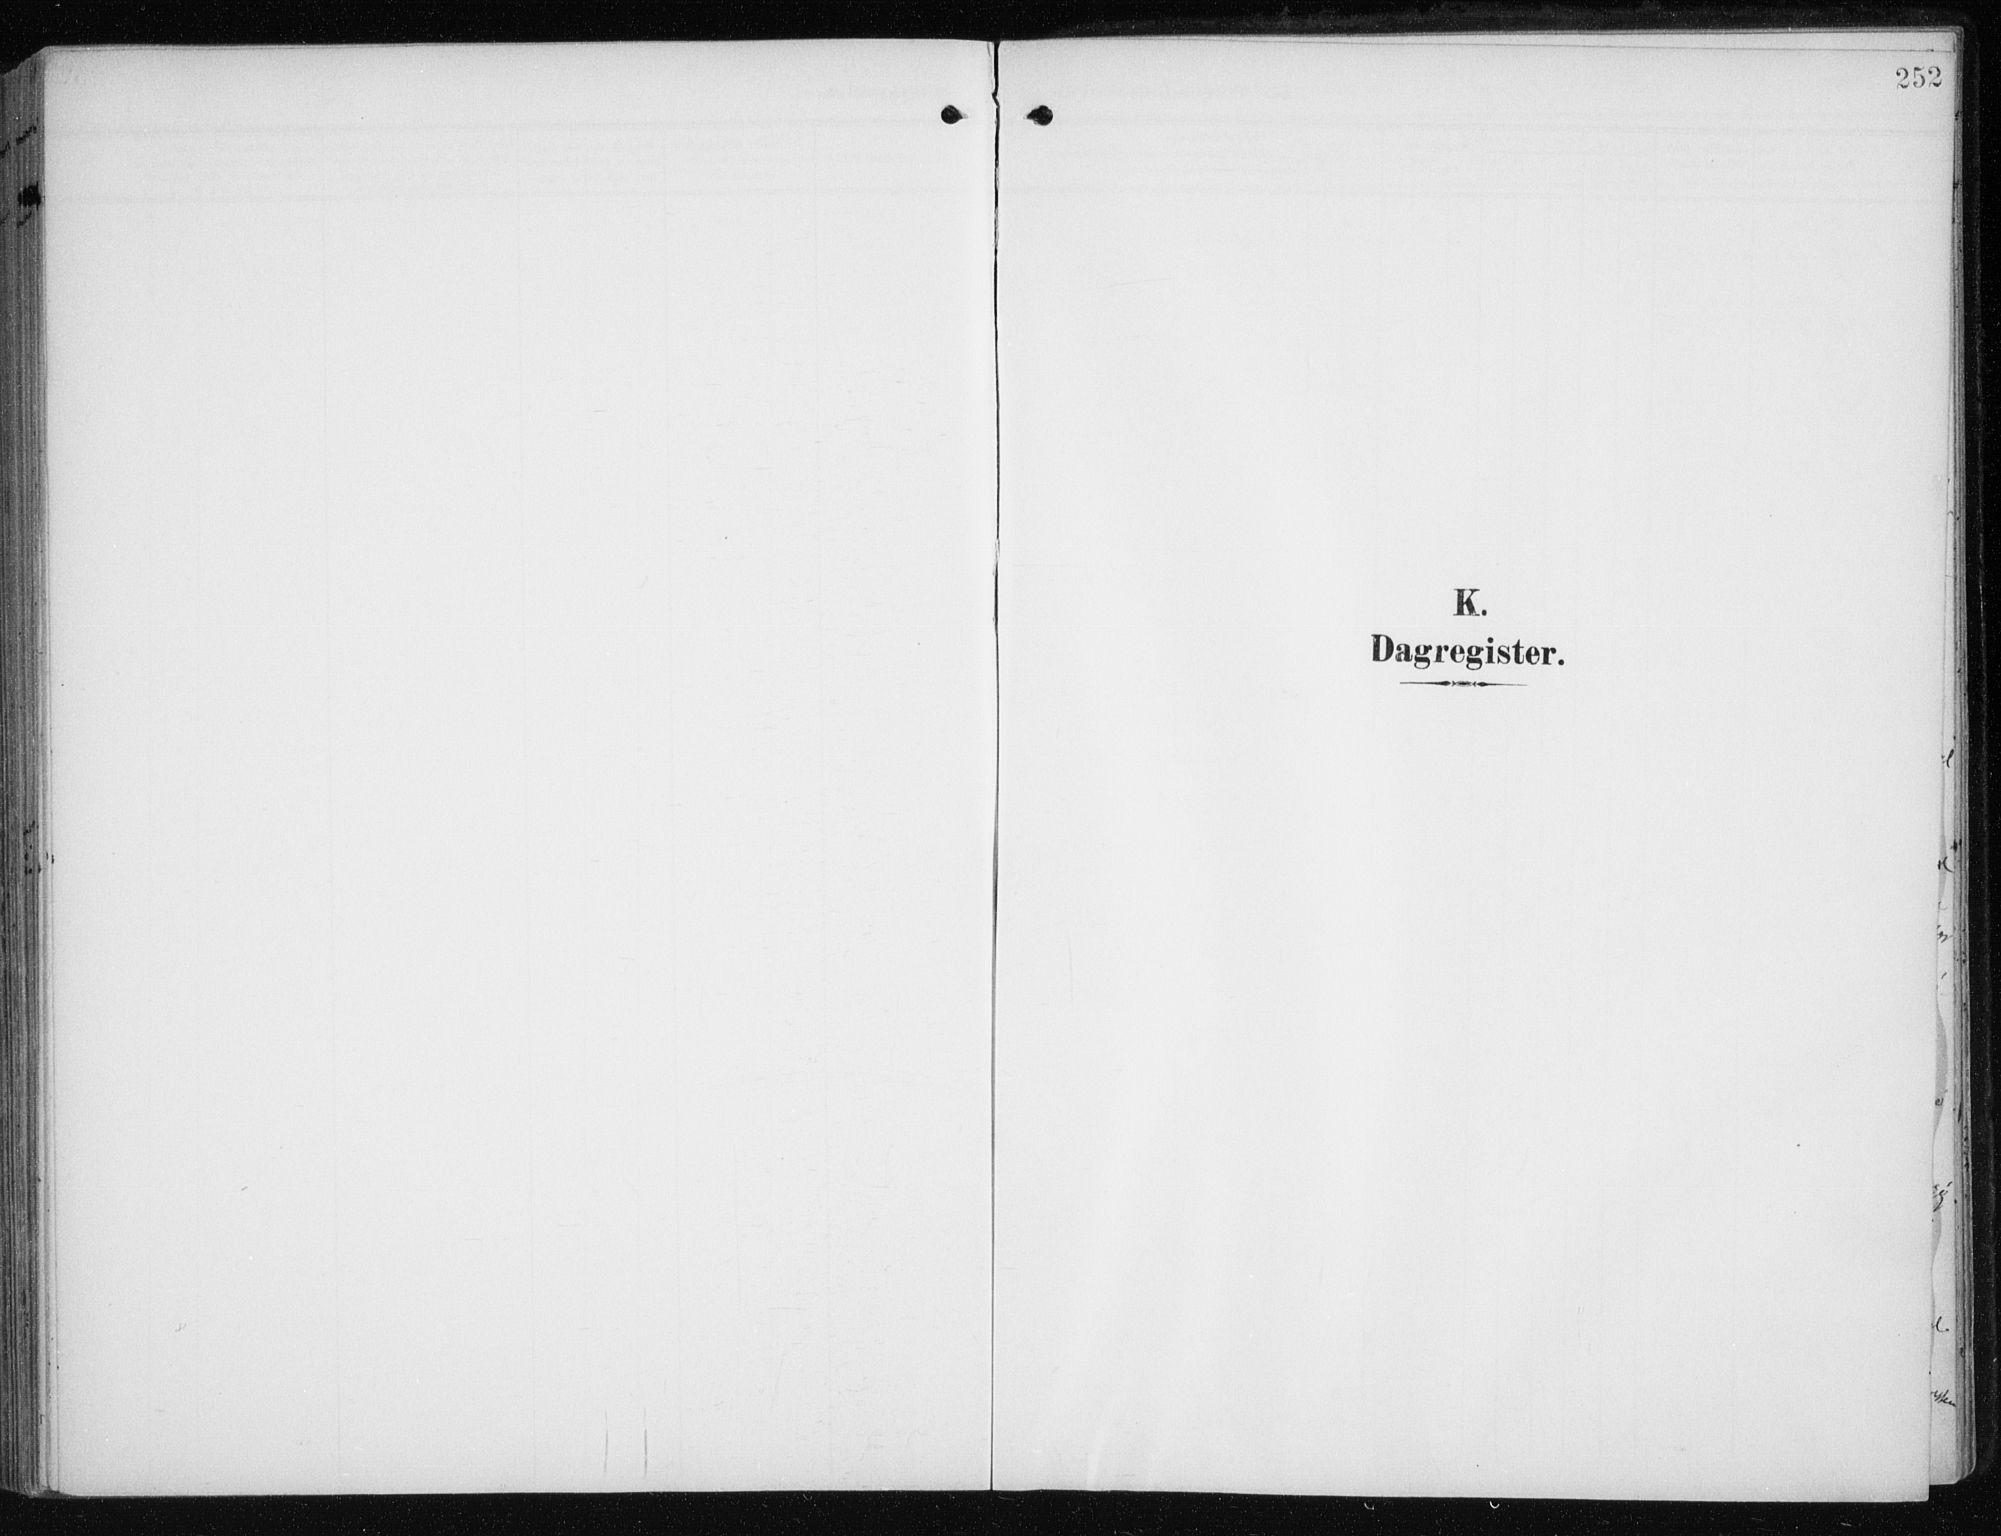 SATØ, Måsøy sokneprestkontor, H/Ha/L0009kirke: Ministerialbok nr. 9, 1903-1914, s. 252